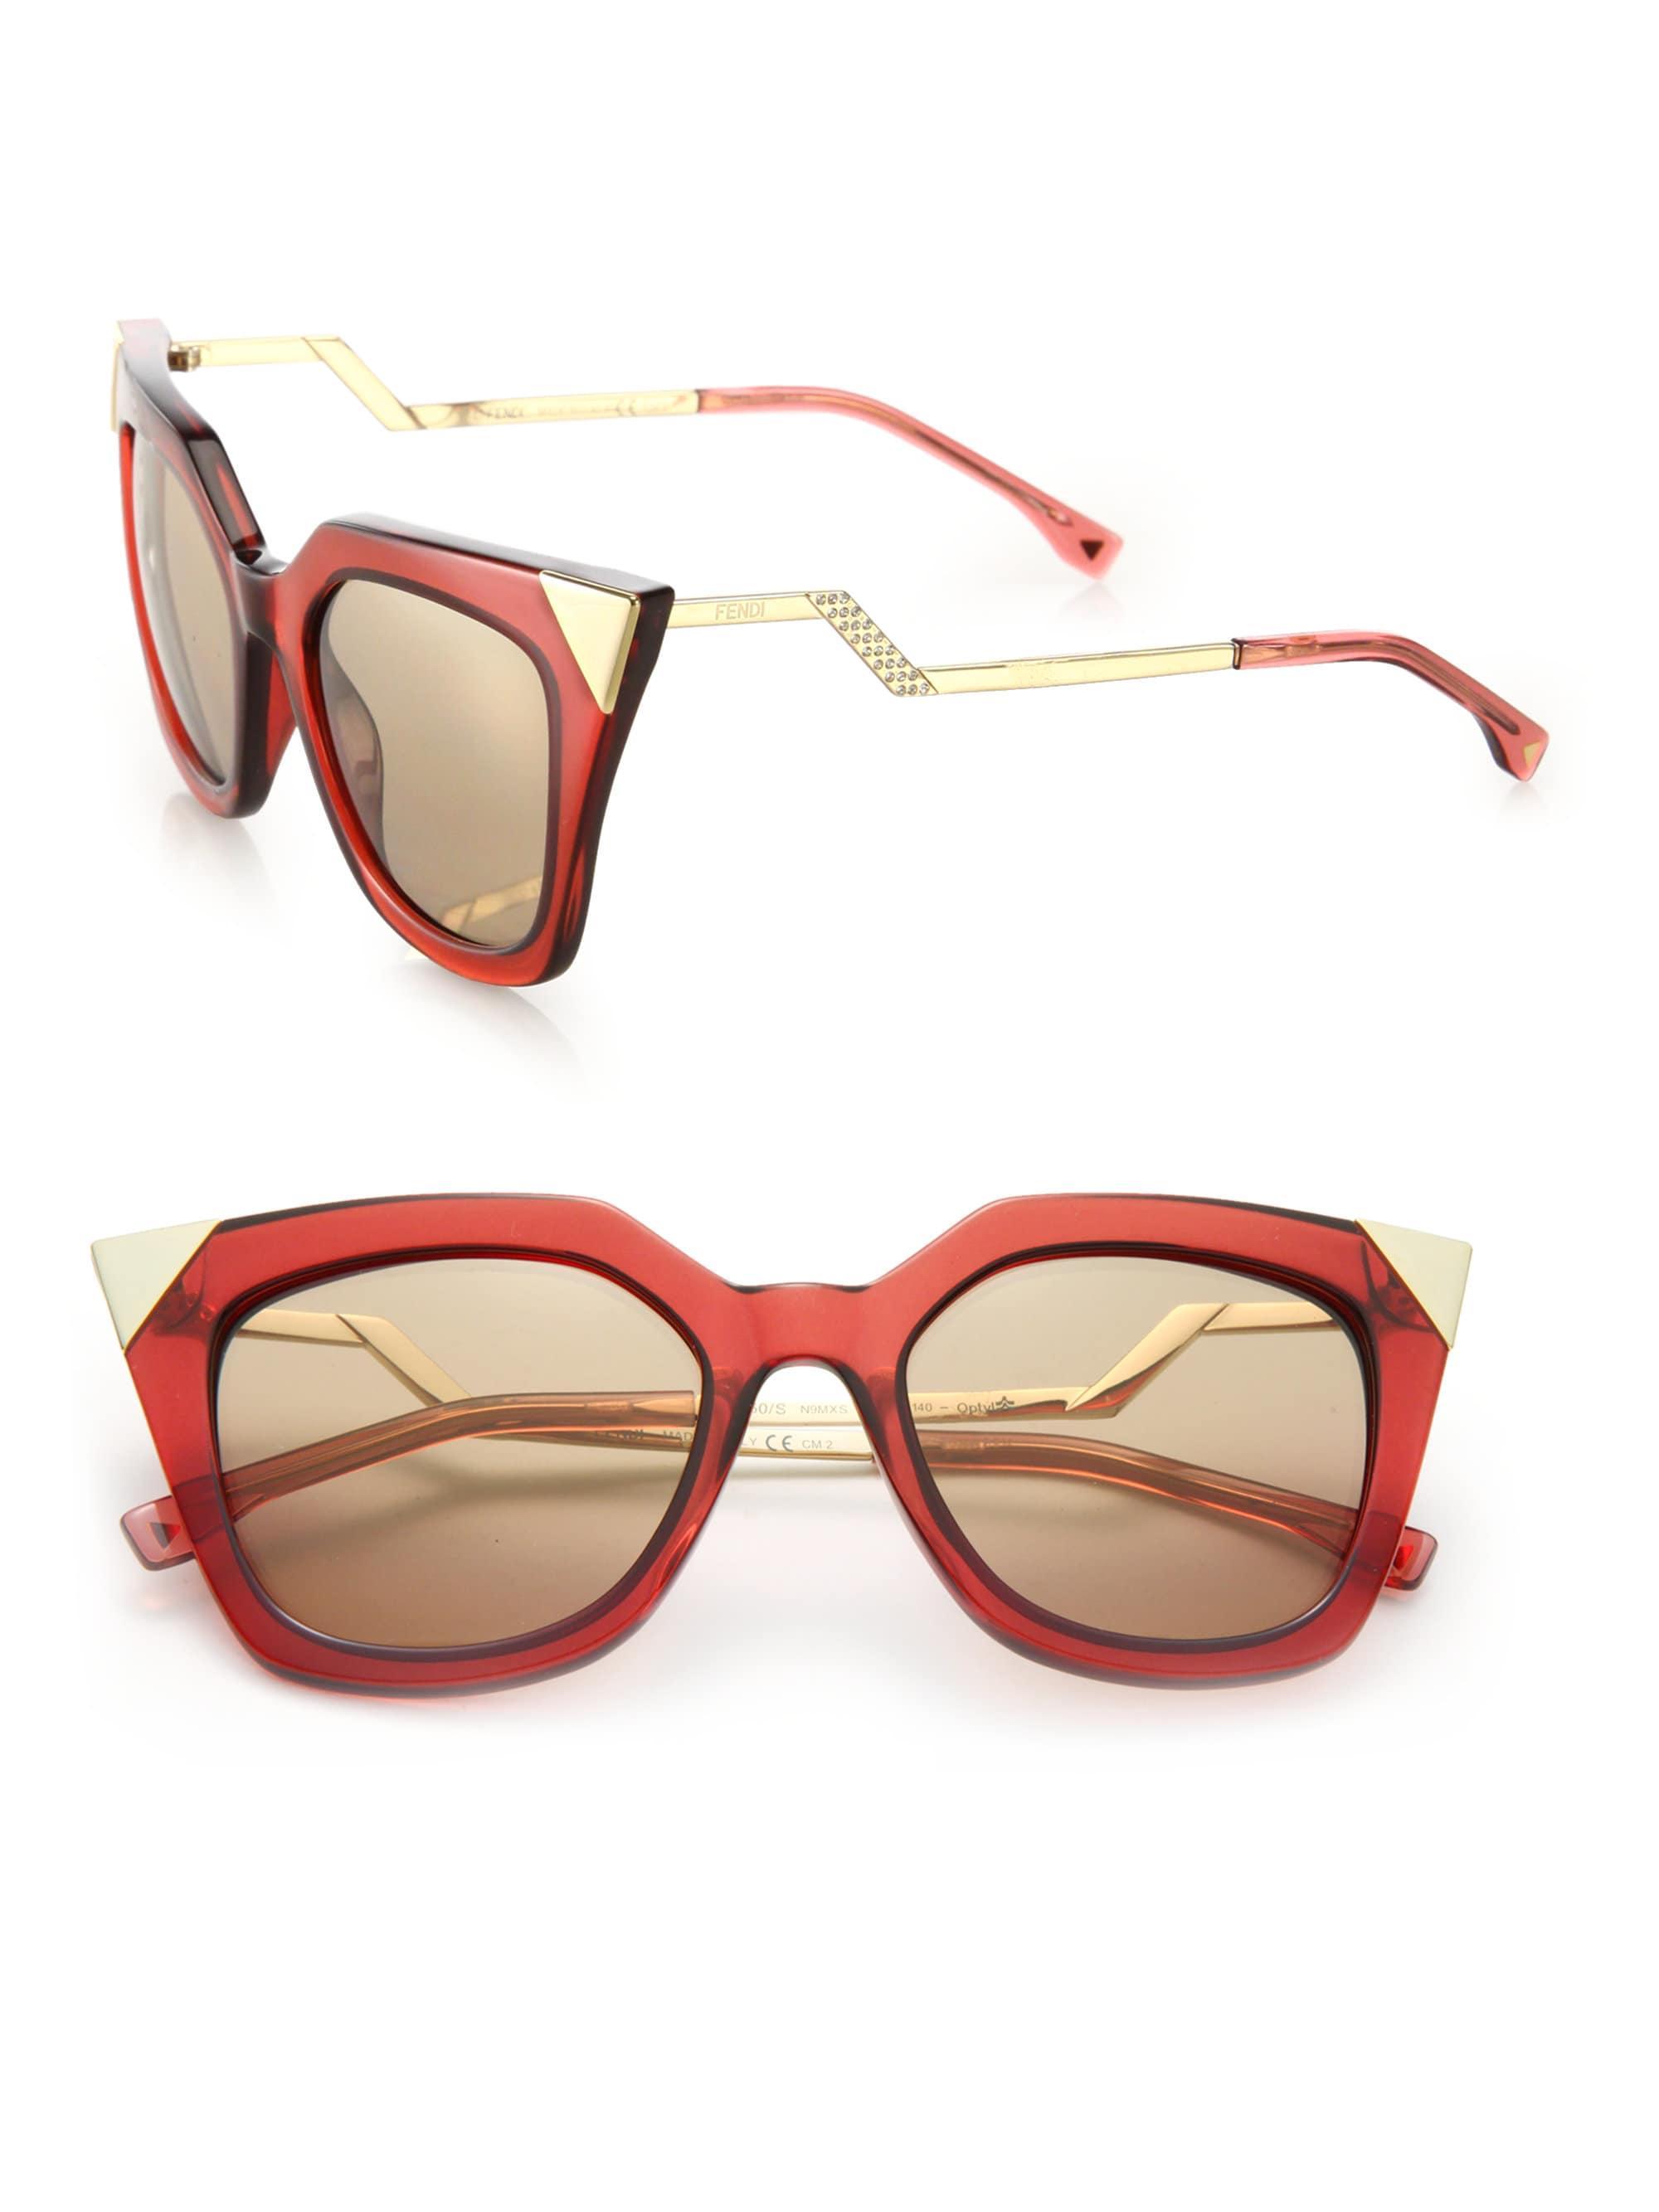 2a9abb07853 Fendi Zig-zag 52mm Cat Eye Sunglasses in Metallic - Lyst